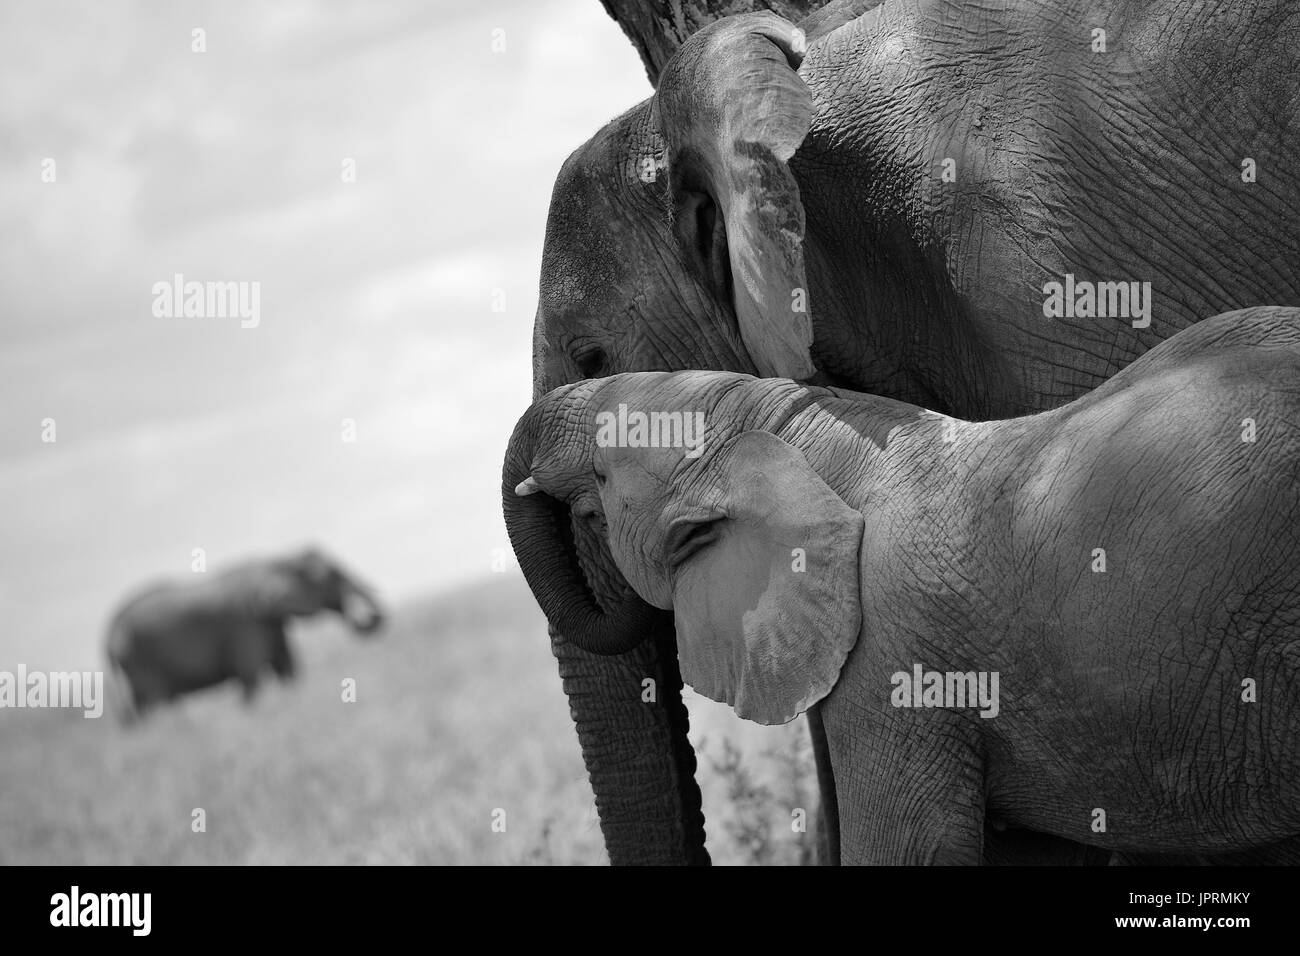 Elephants Roam the Serengeti - Stock Image